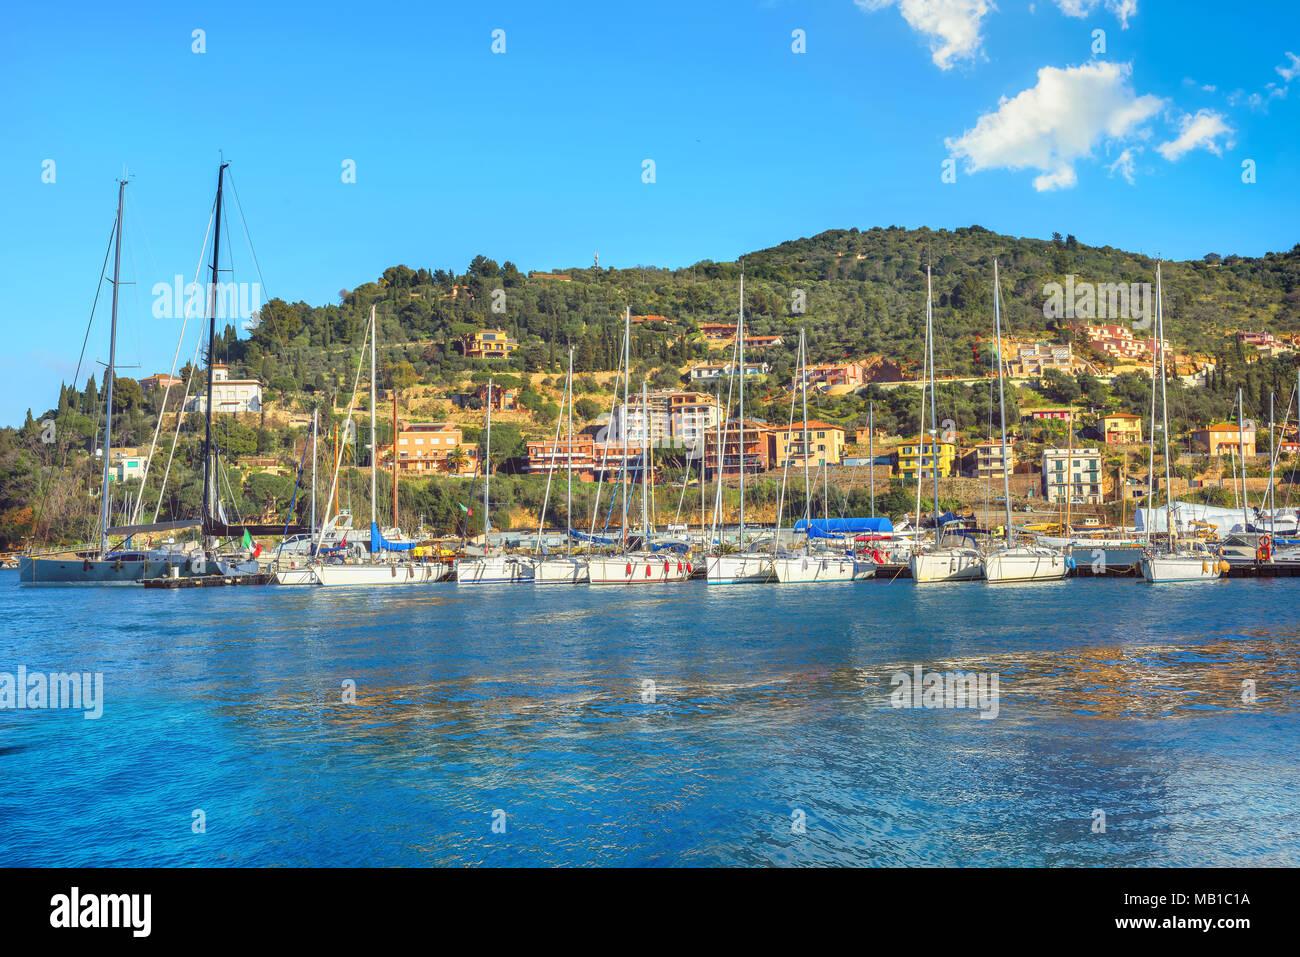 Waterfront of Porto Santo Stefano harbor. Monte Argentario, Tuscany, Italy - Stock Image